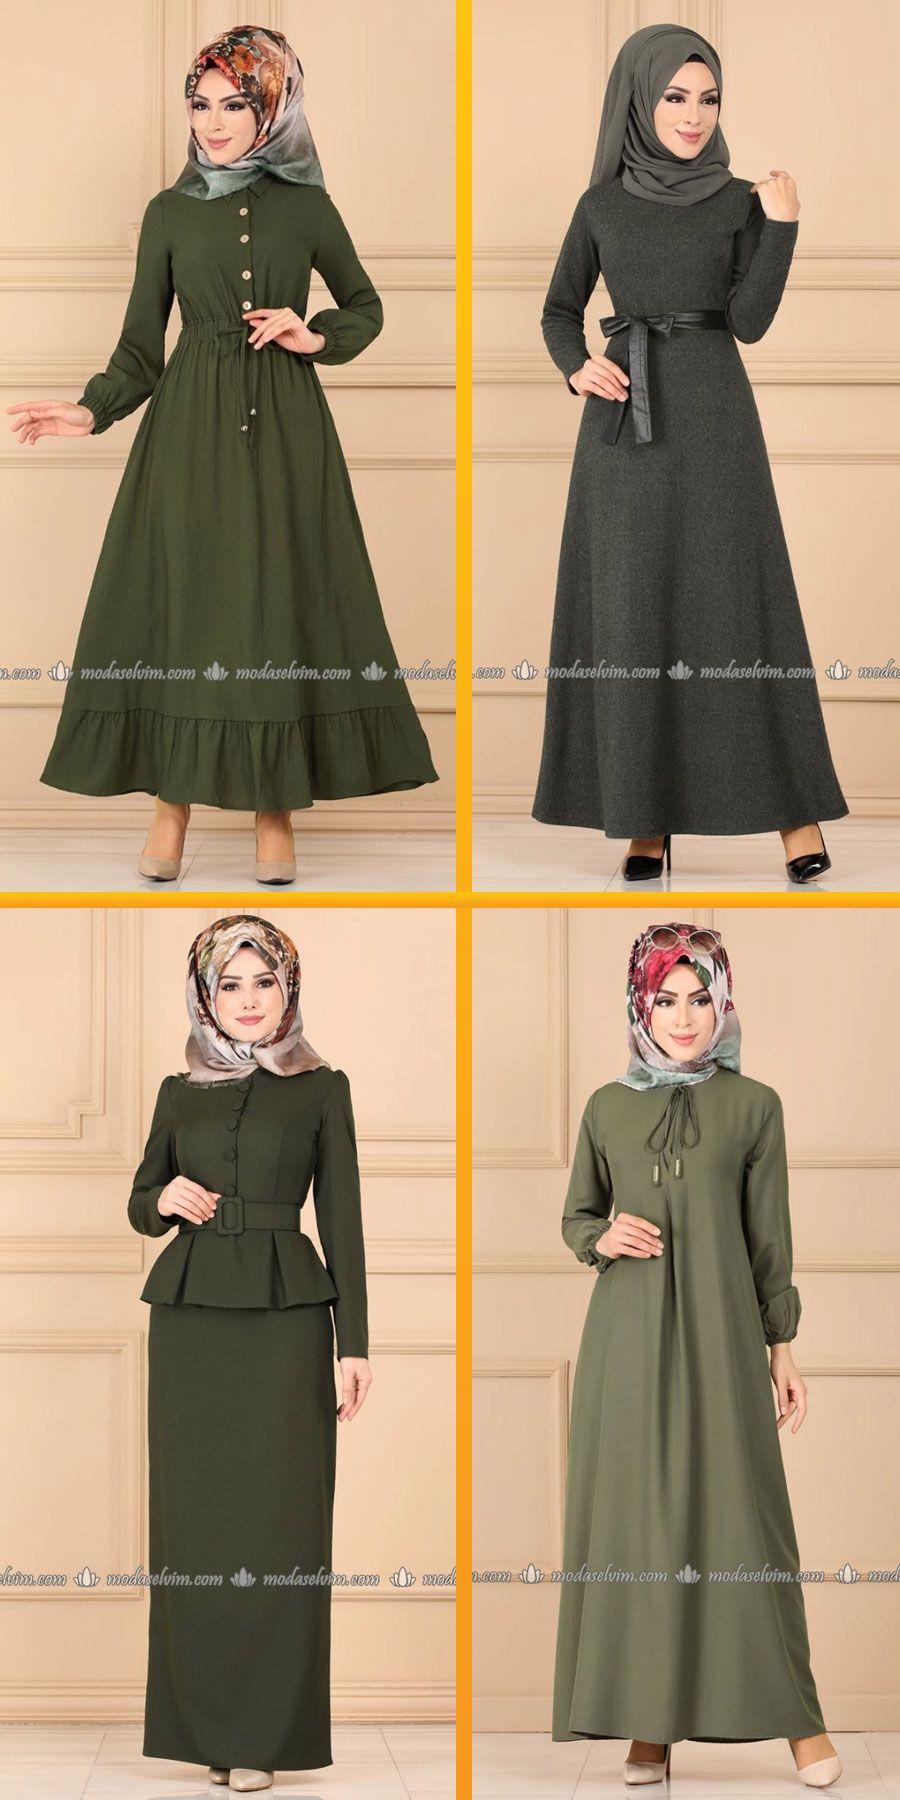 2020 Kis Modaselvim Haki Tesettur Elbise Modelleri 1 7 2020 Elbise Modelleri Elbise The Dress